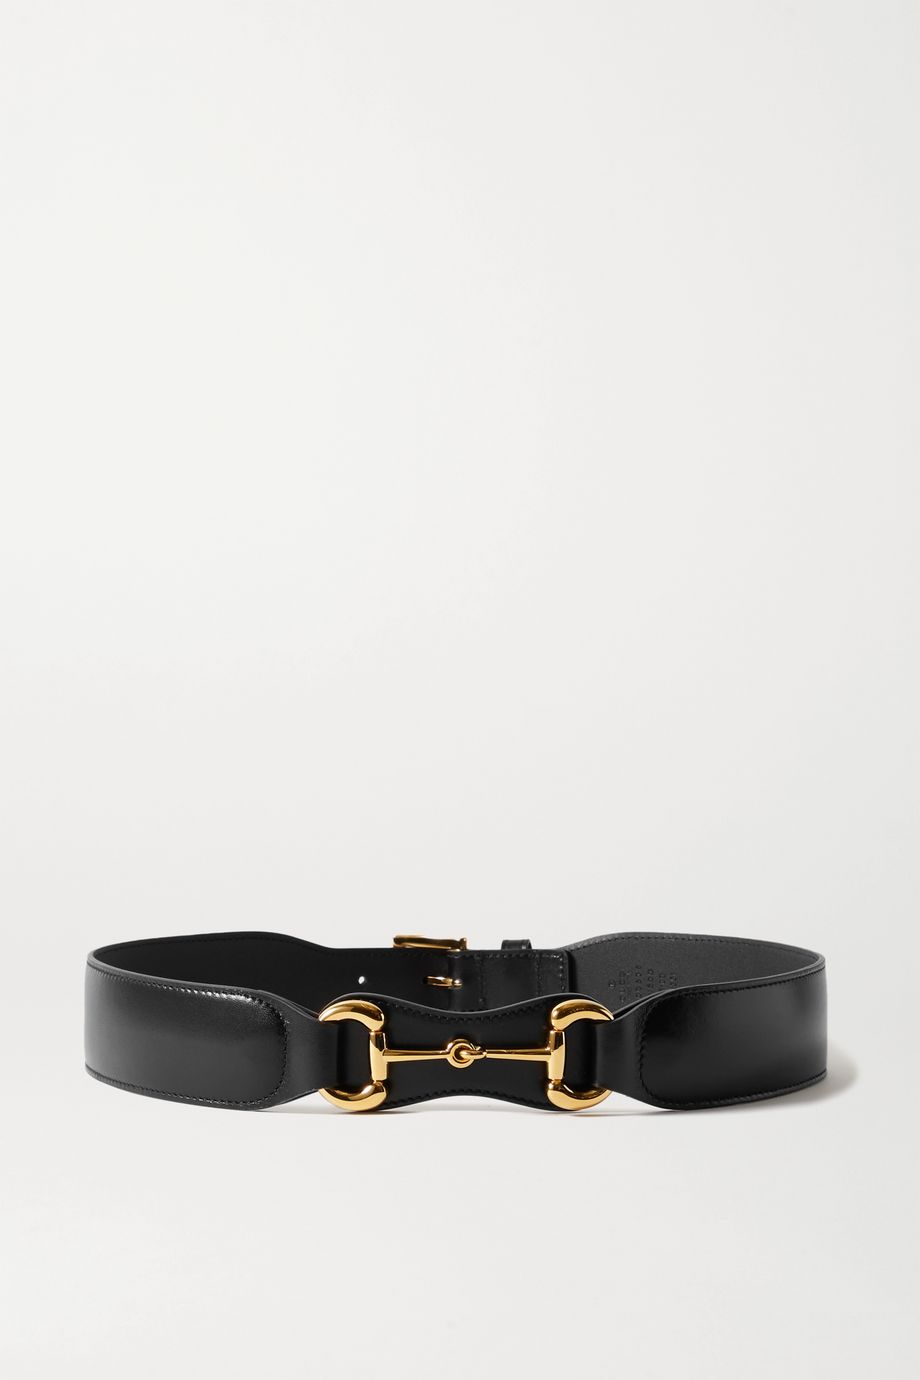 Gucci Horsebit-detailed leather belt